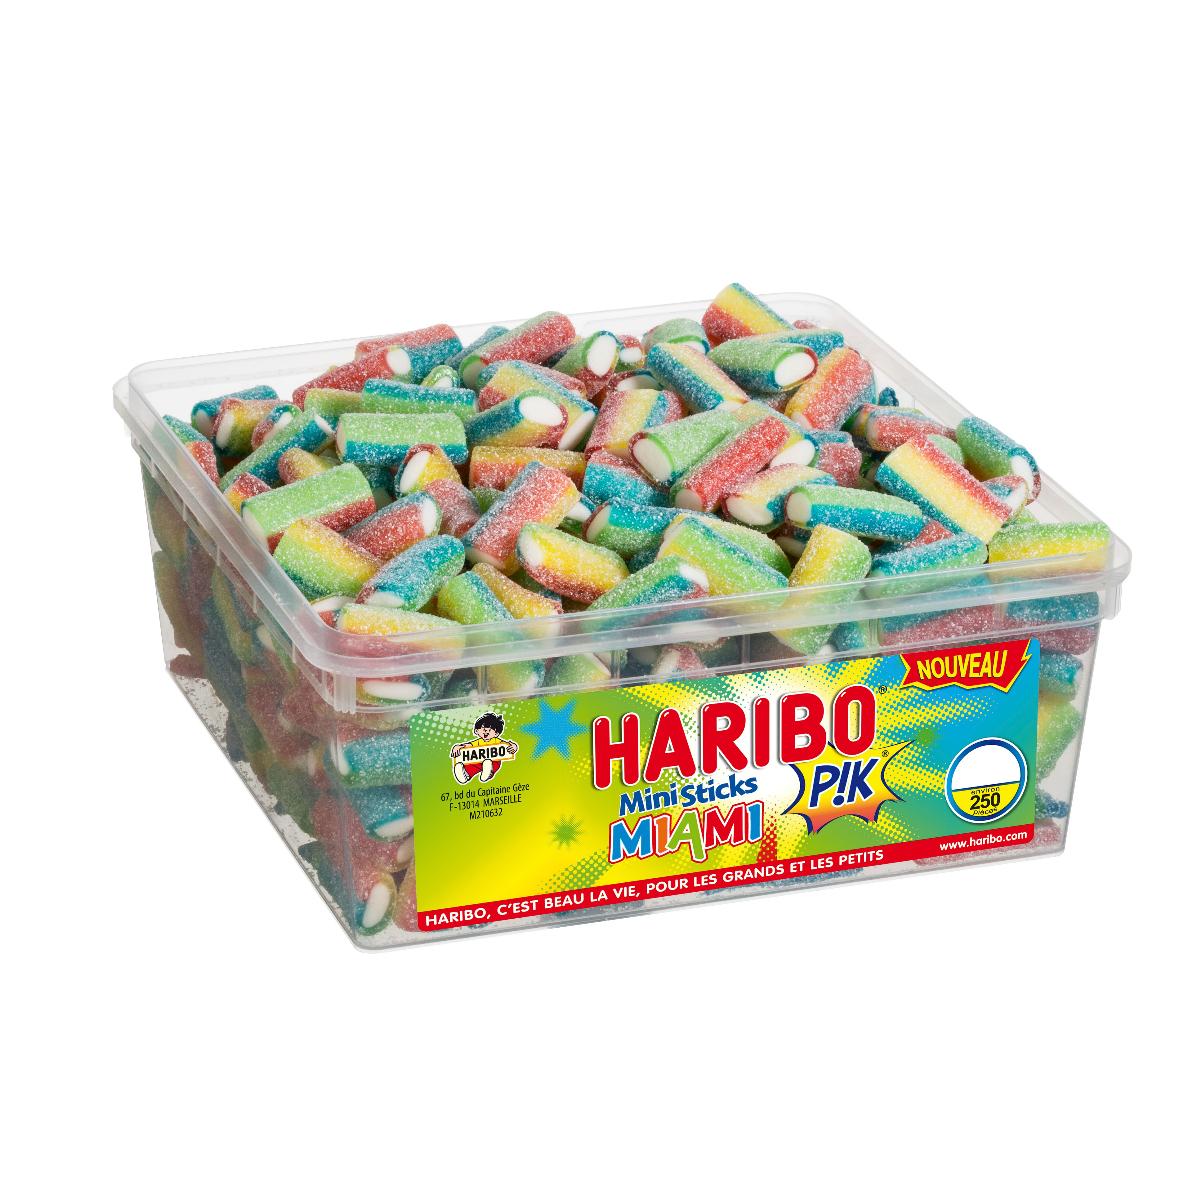 bonbon haribo ministick miami pik